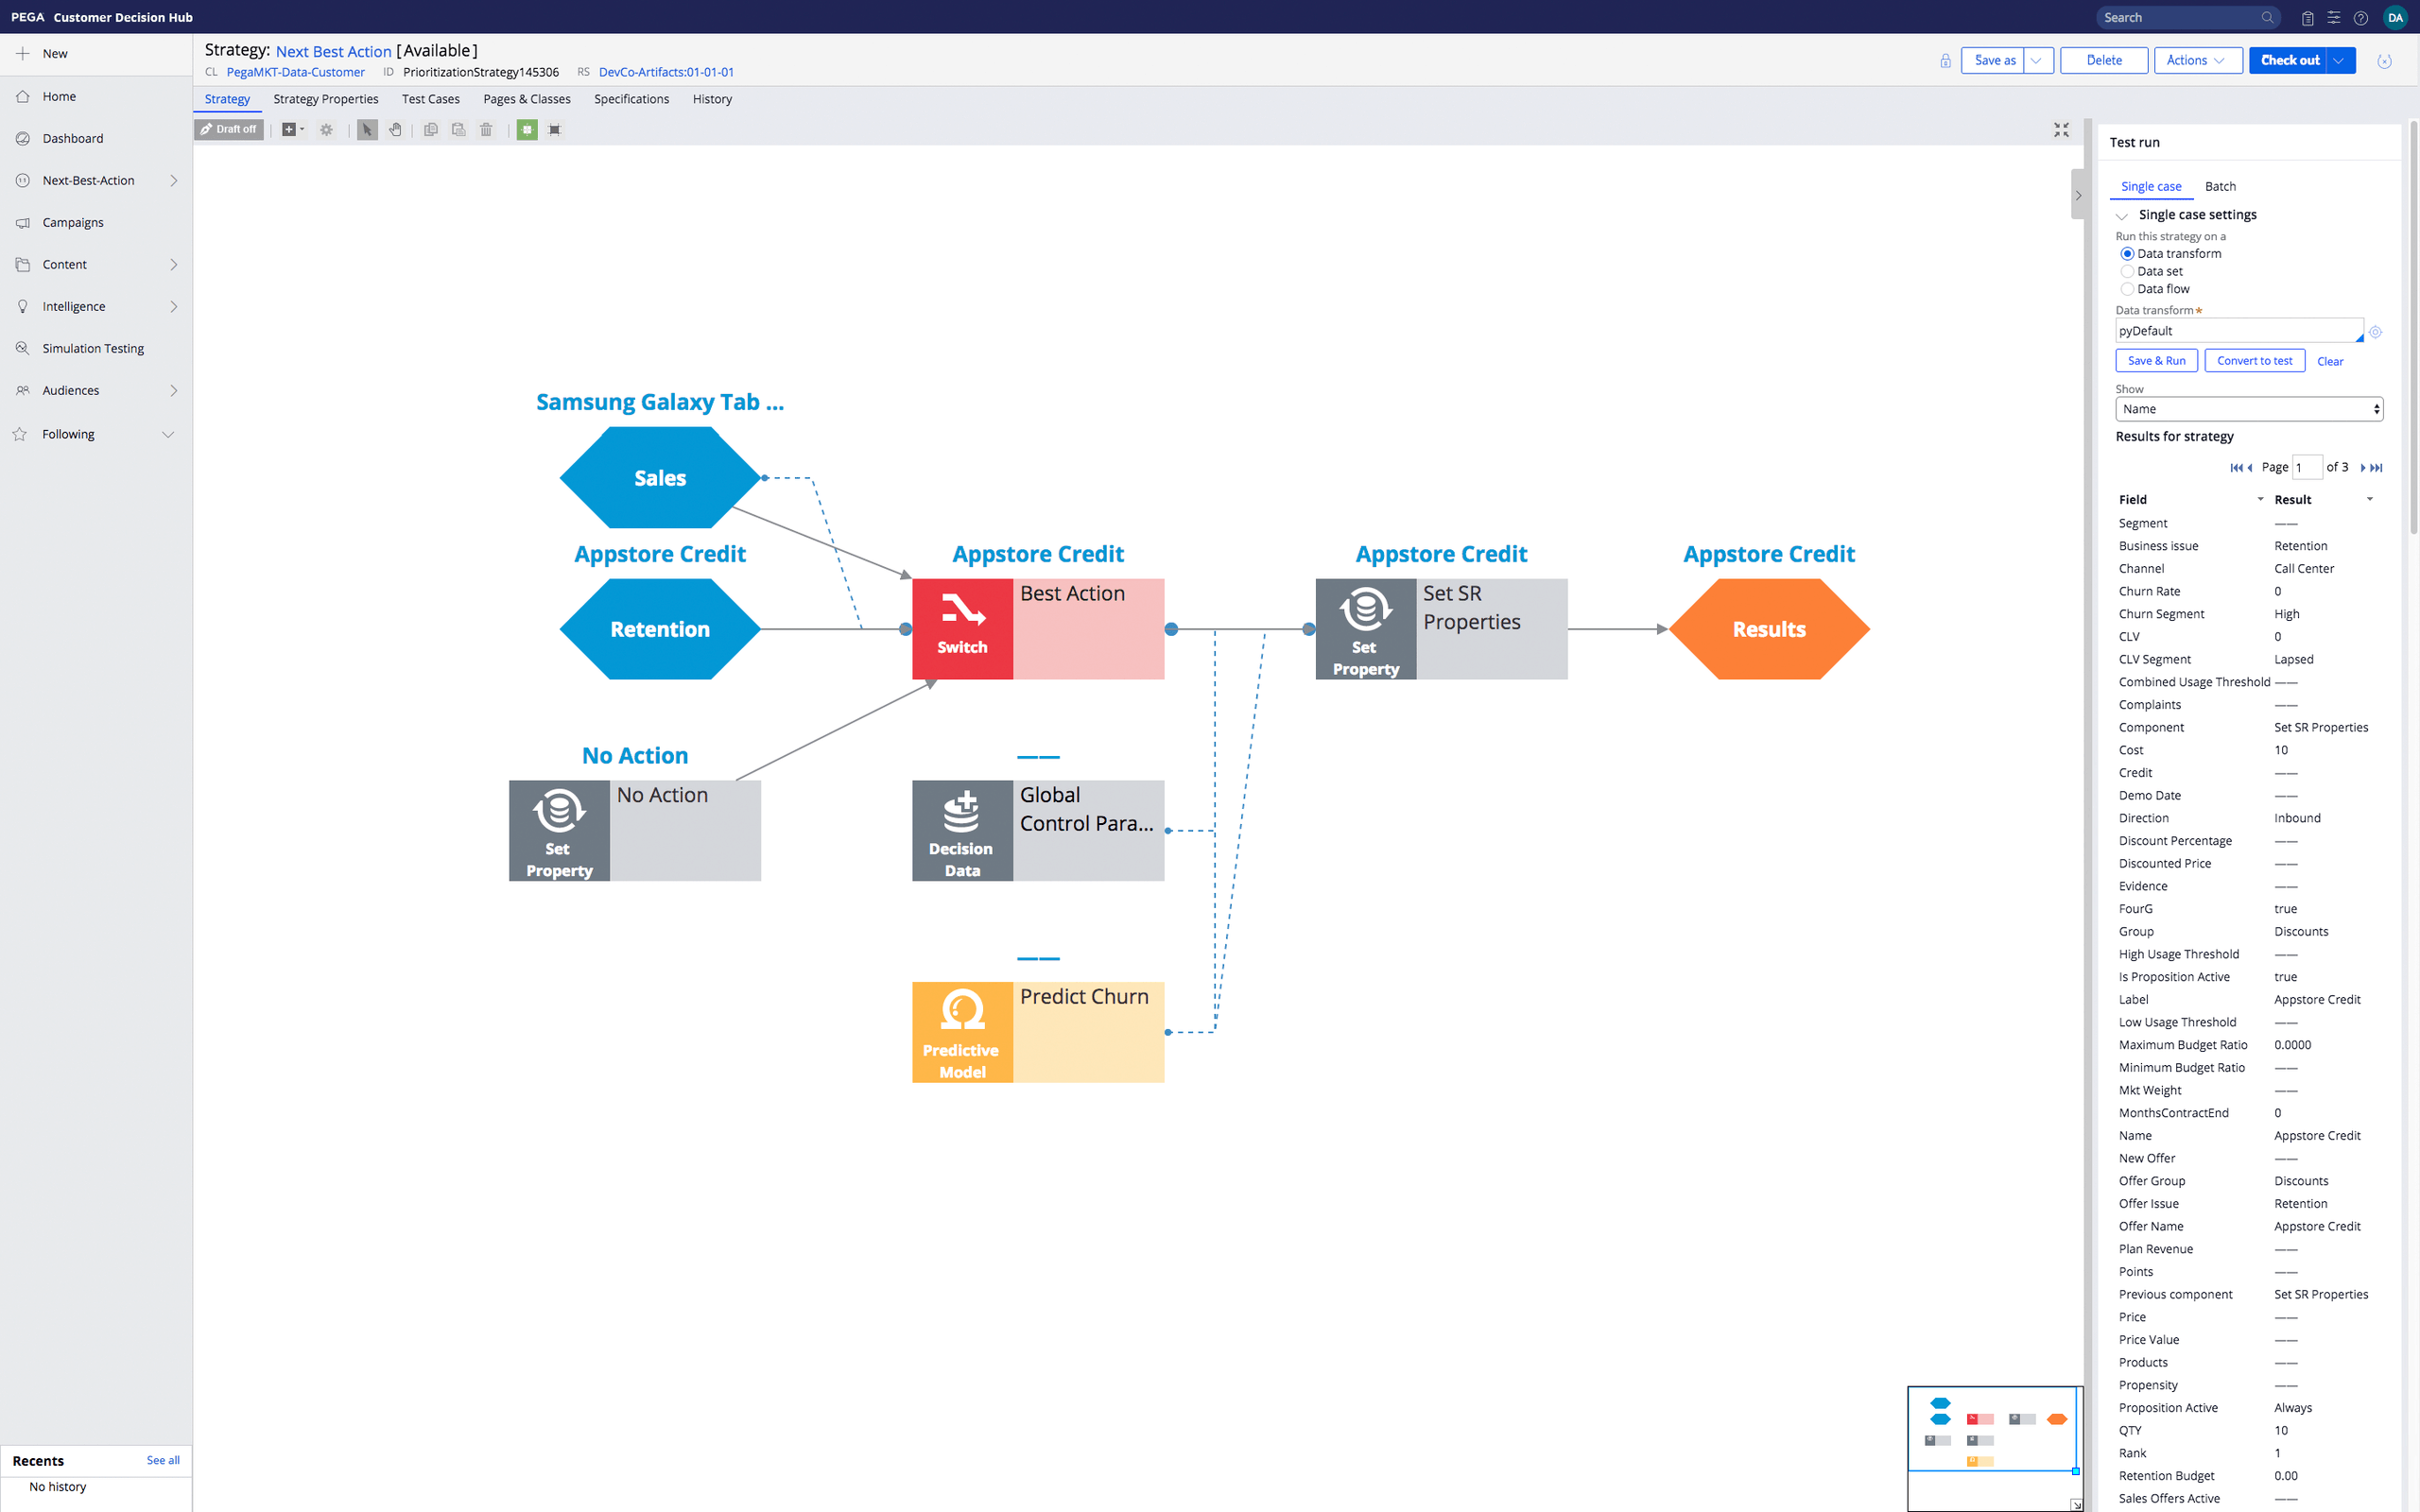 Customer Decision Hub: Monetize Big Data